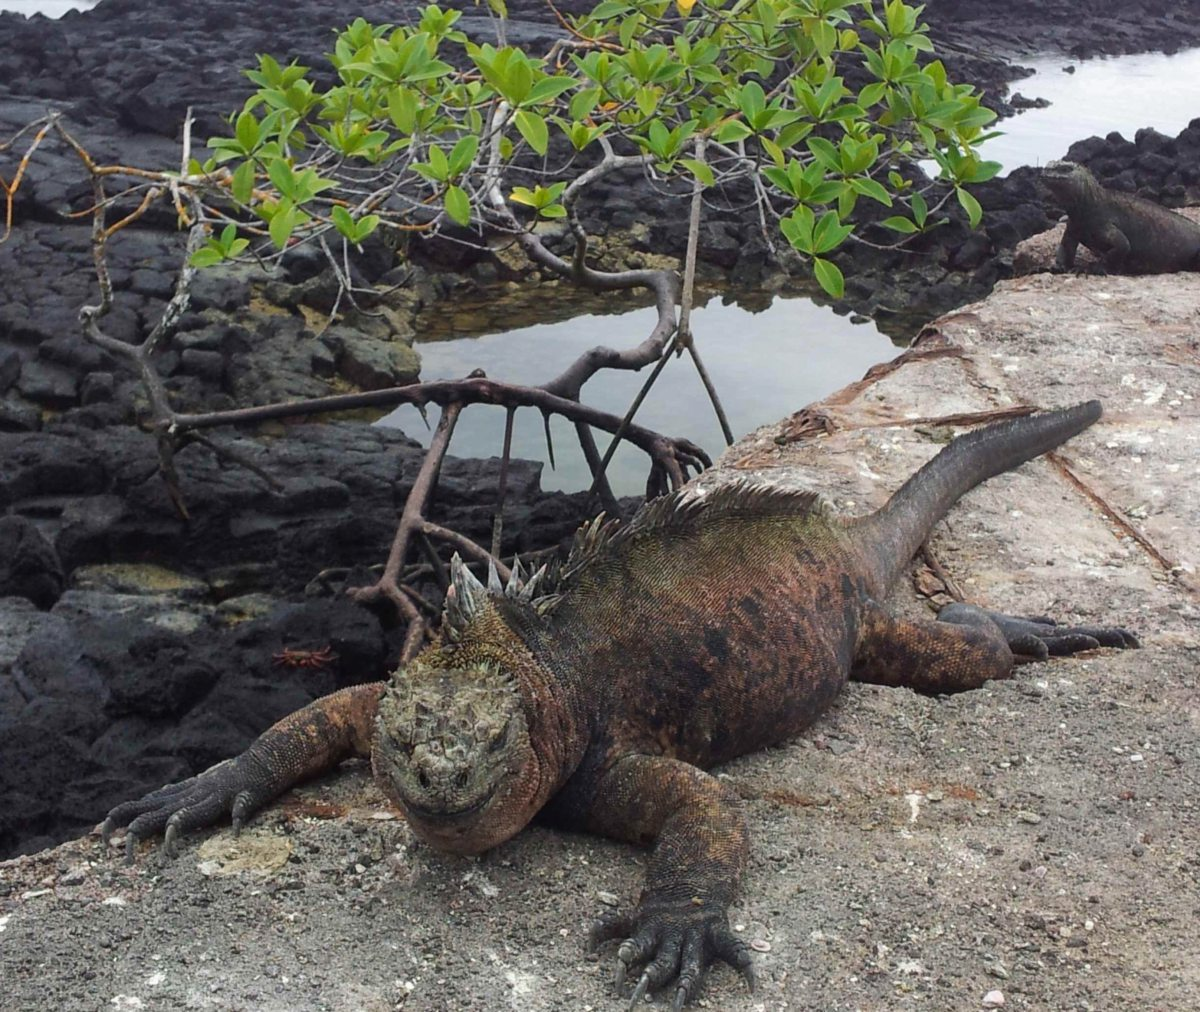 Echsen im Naturparadies Galapagos, Ecuador